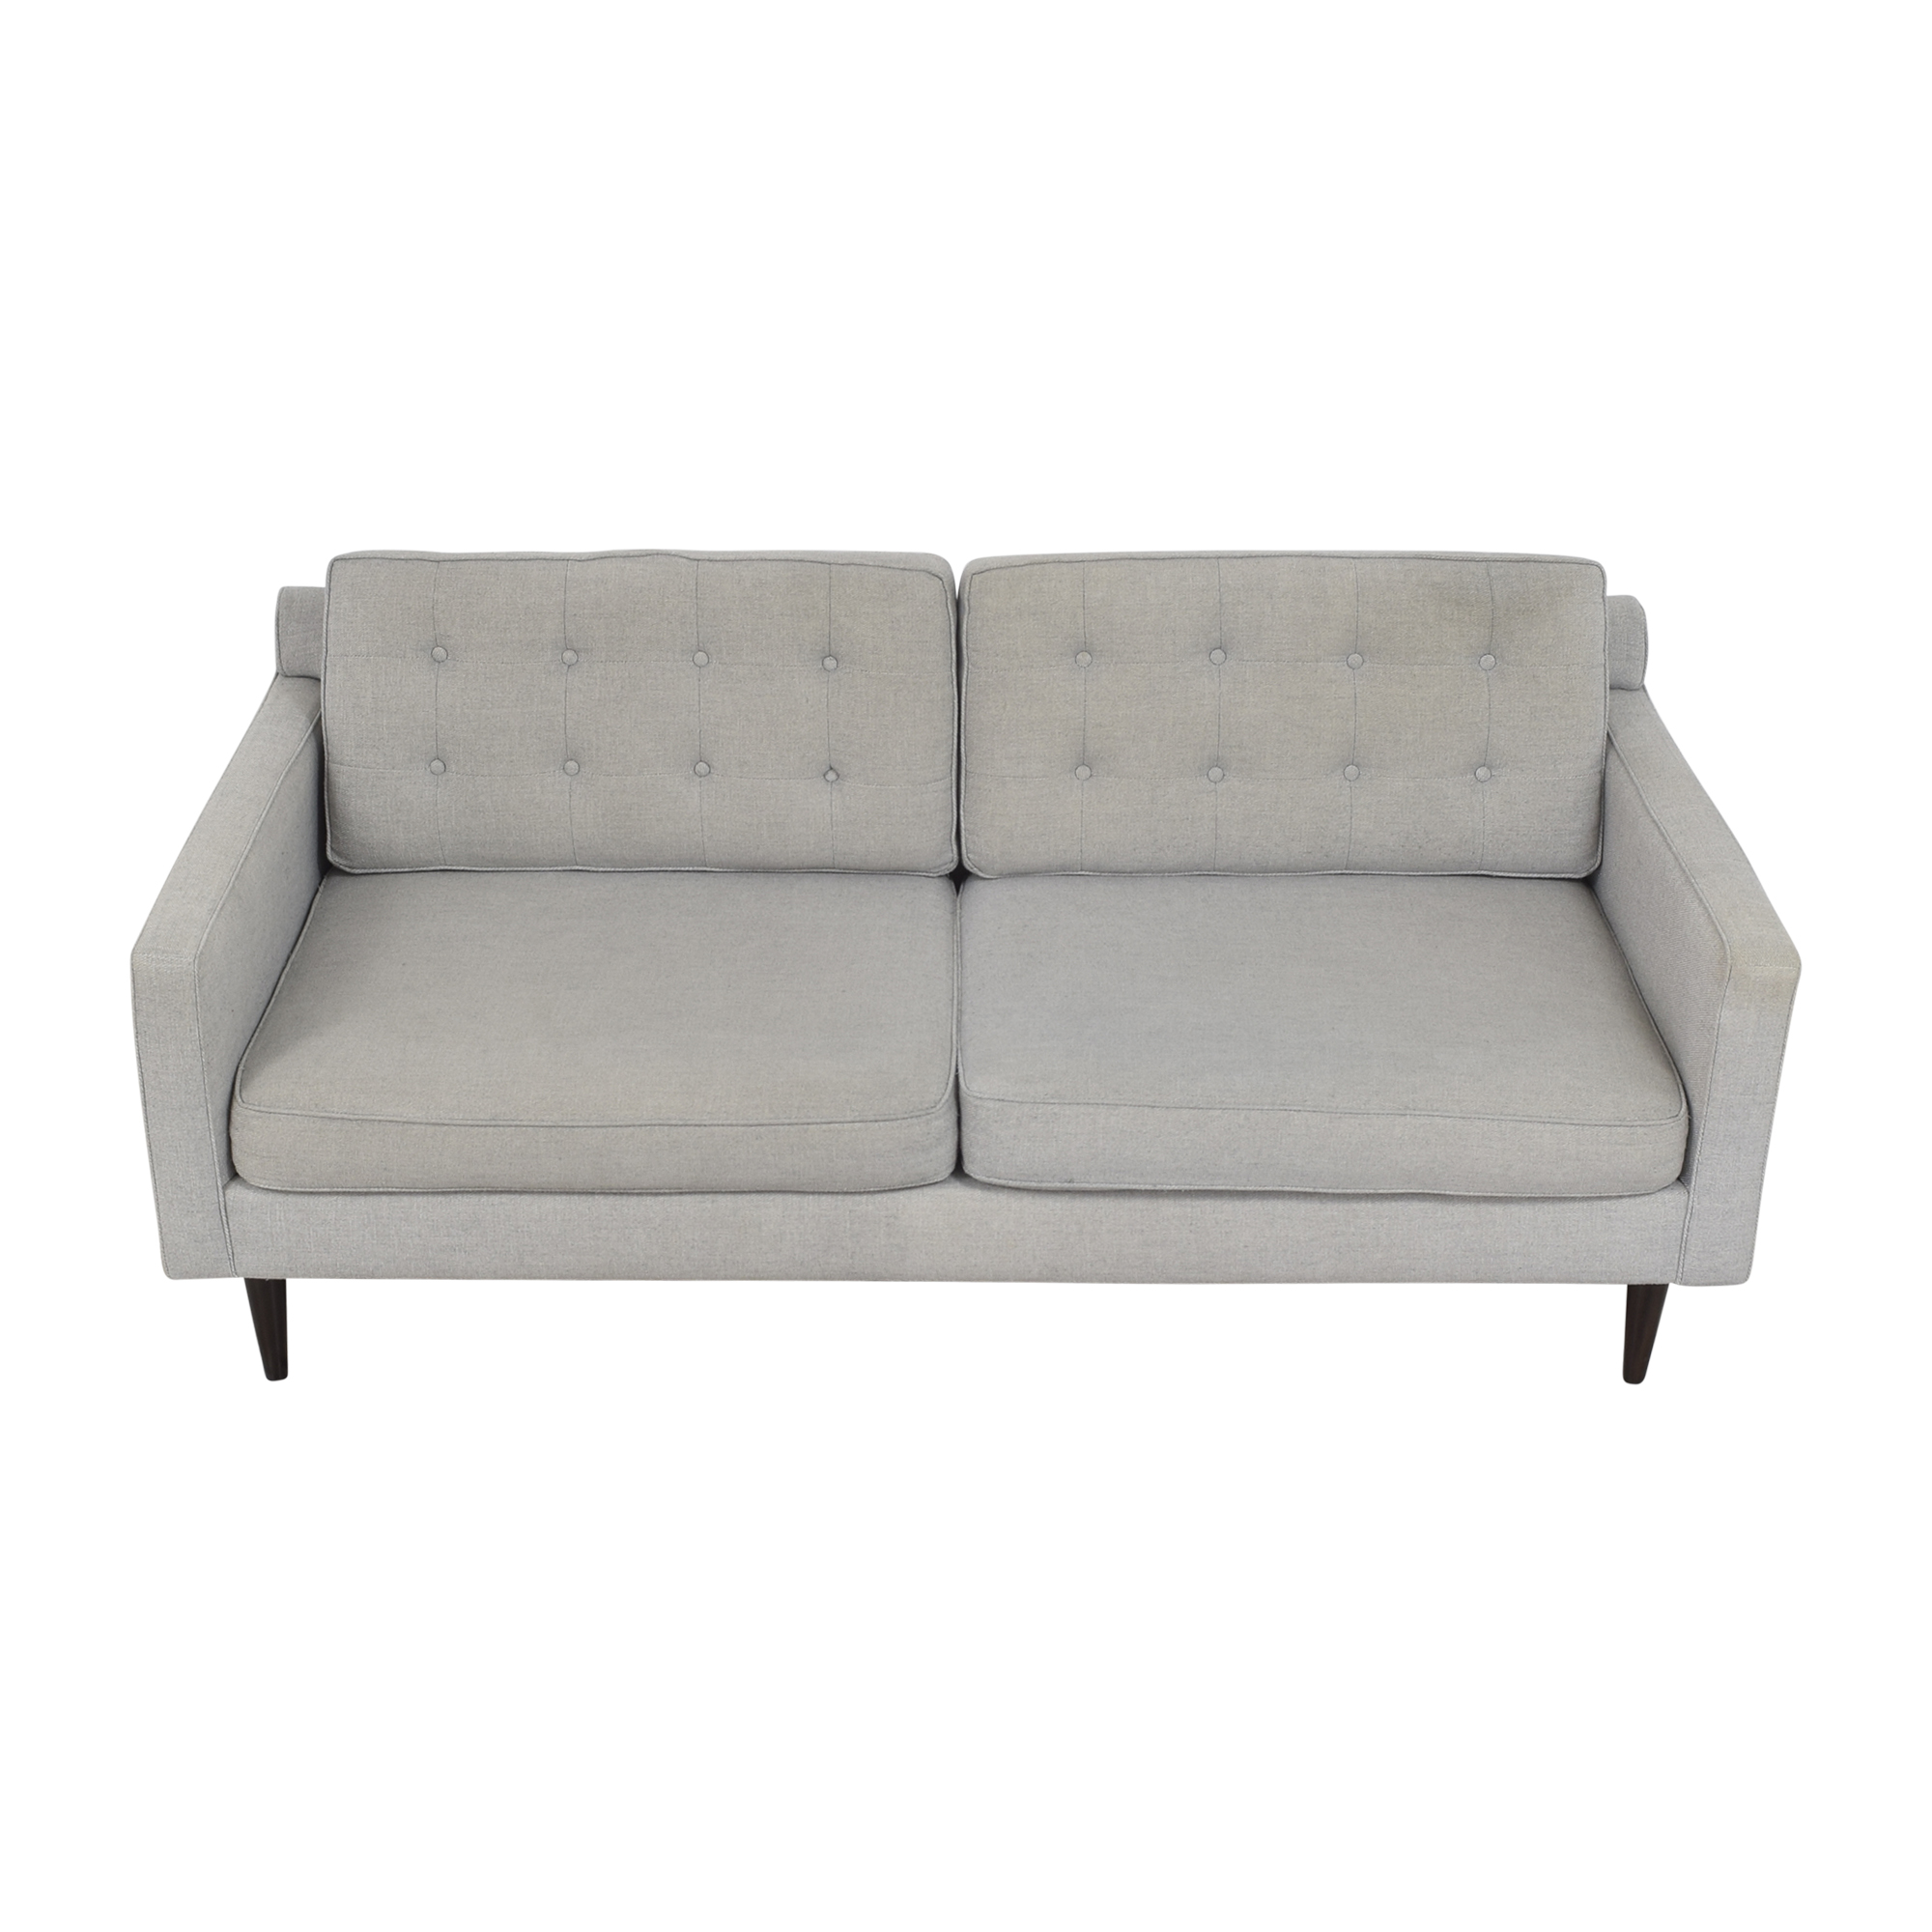 buy West Elm Drake Mid Century Sofa West Elm Classic Sofas